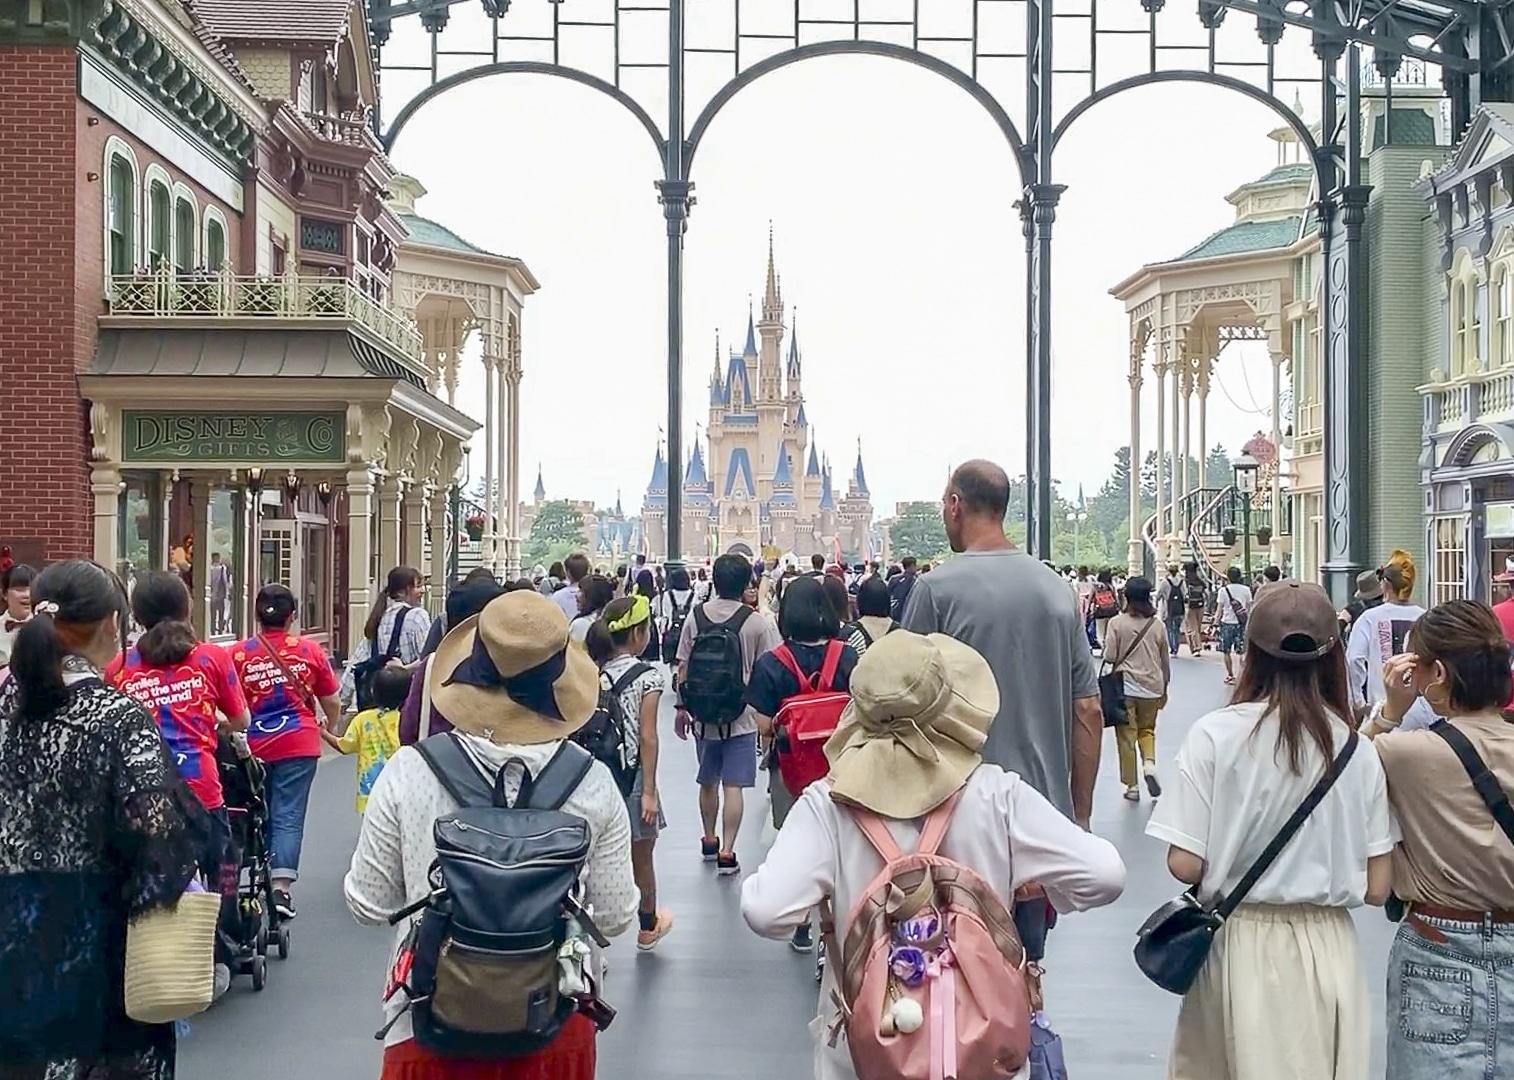 People walk into Tokyo Disneyland through World Bazaar.